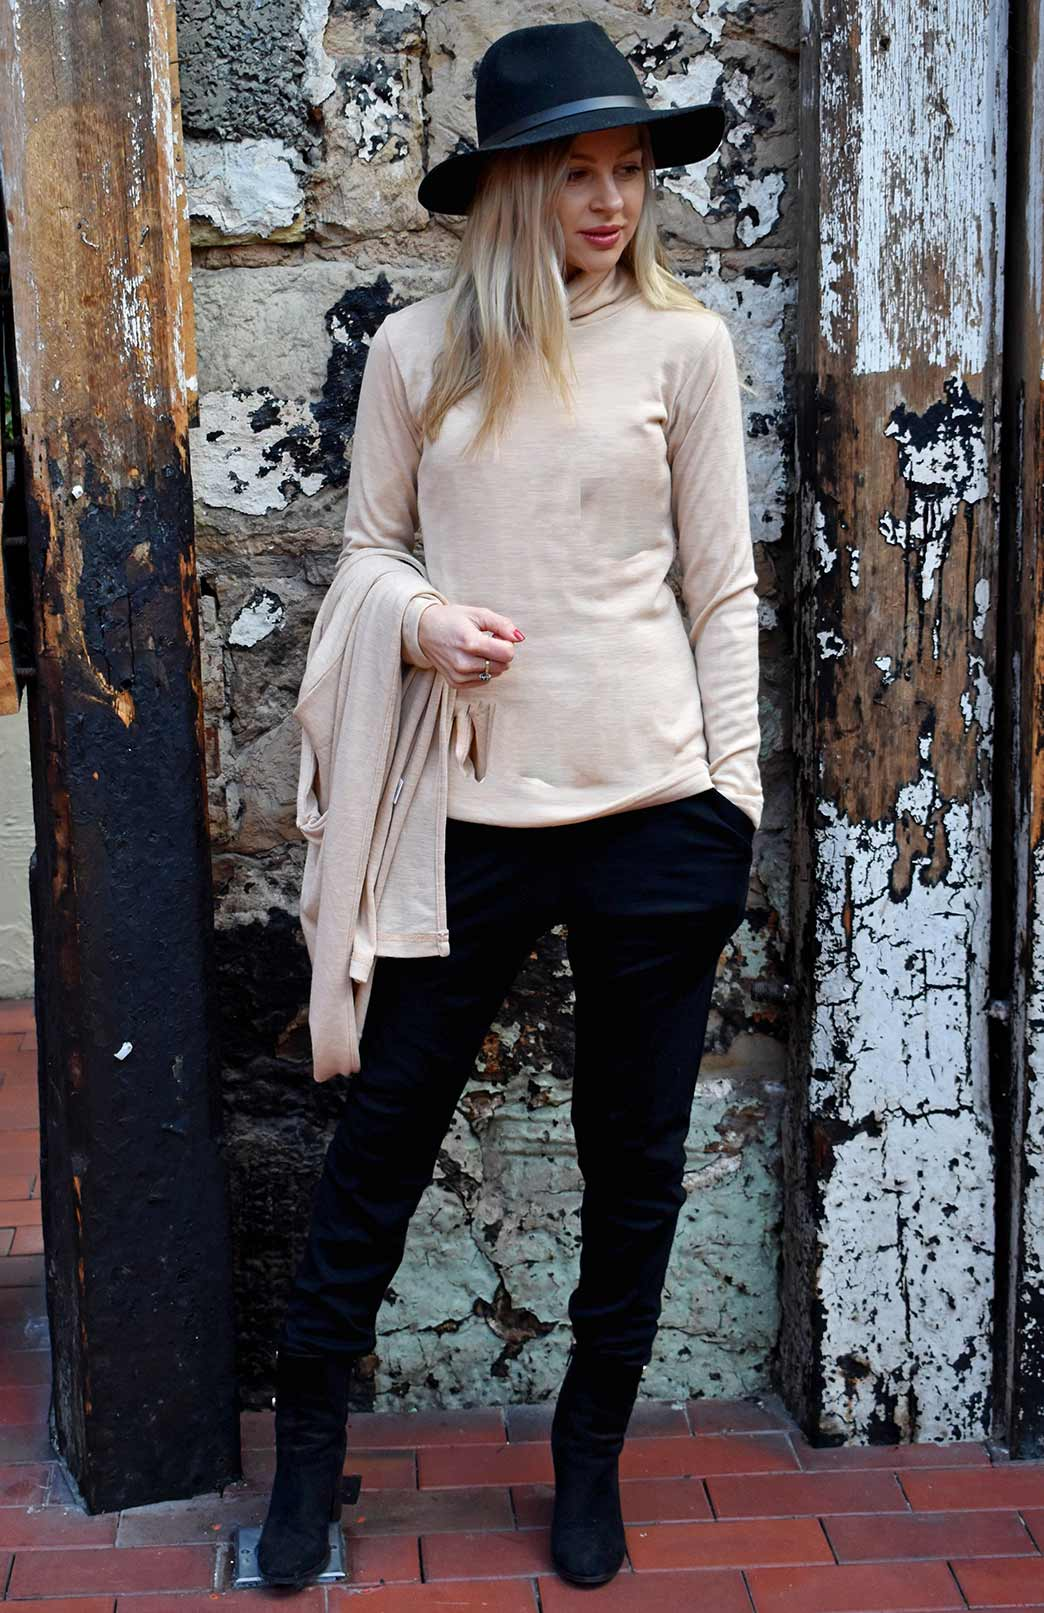 Polo Neck Top - Women's Merino Wool Long Sleeved Polo Neck Top - Smitten Merino Tasmania Australia